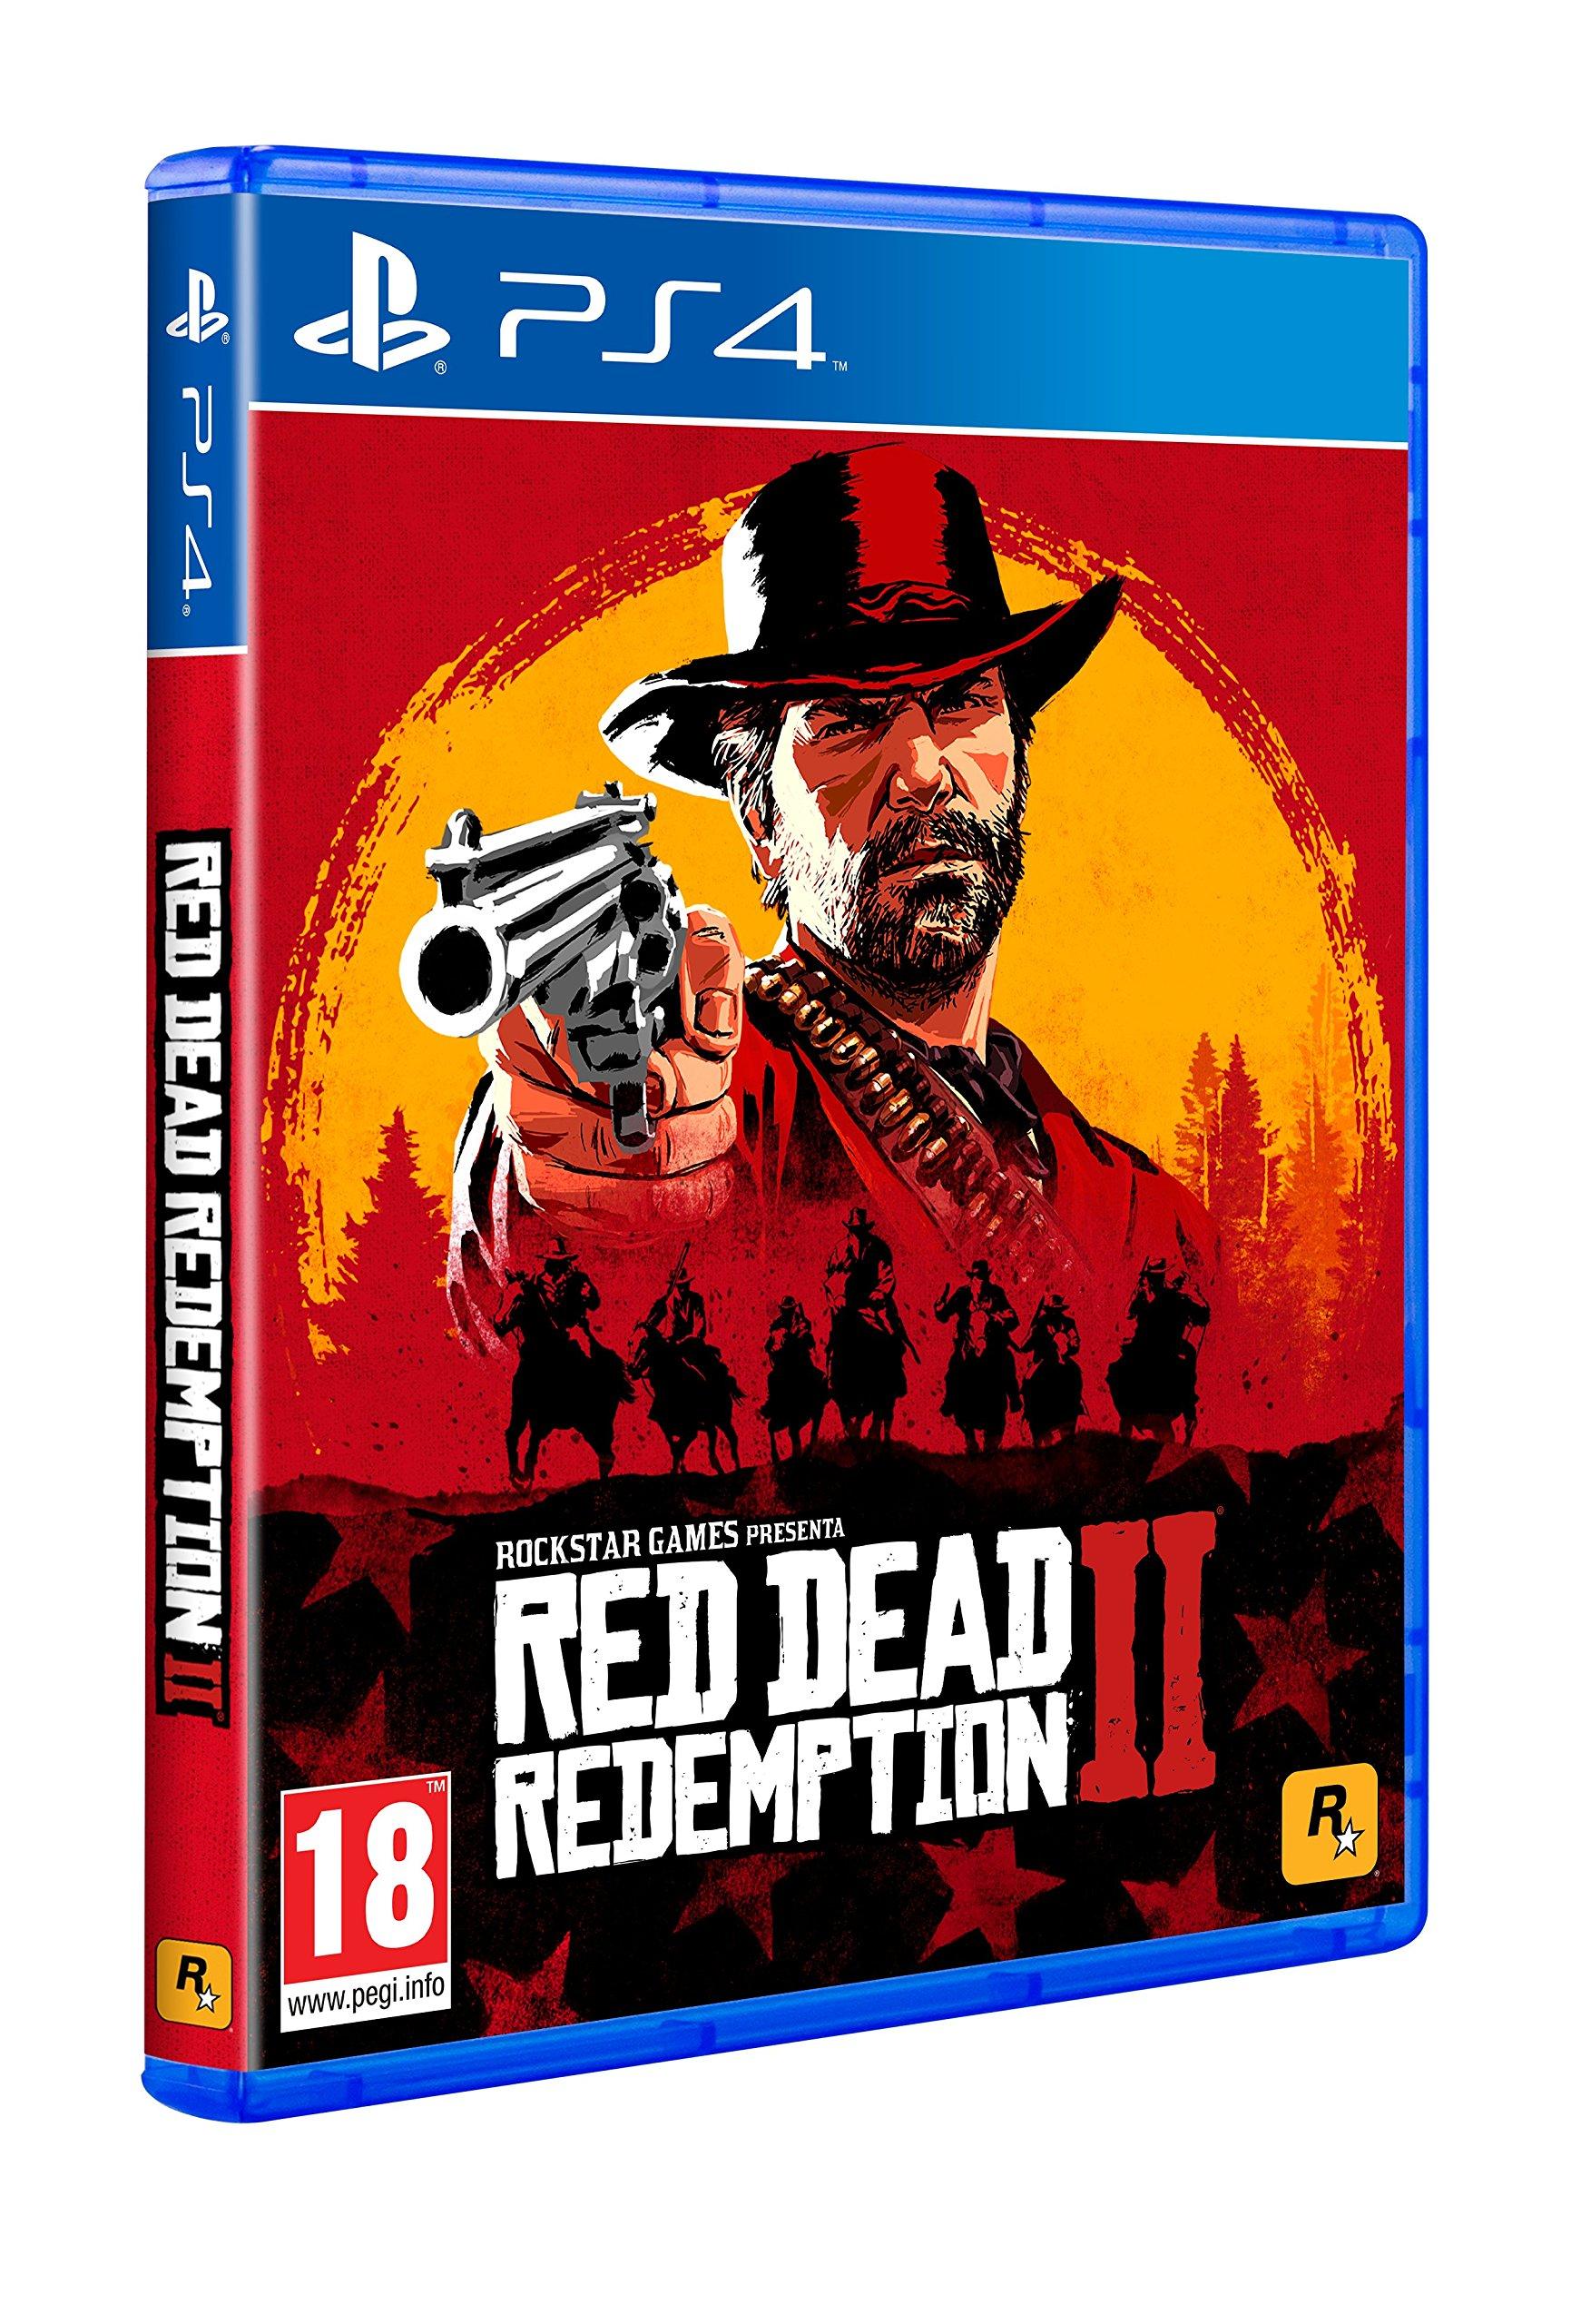 Red Dead Redemption 2 (Variation)